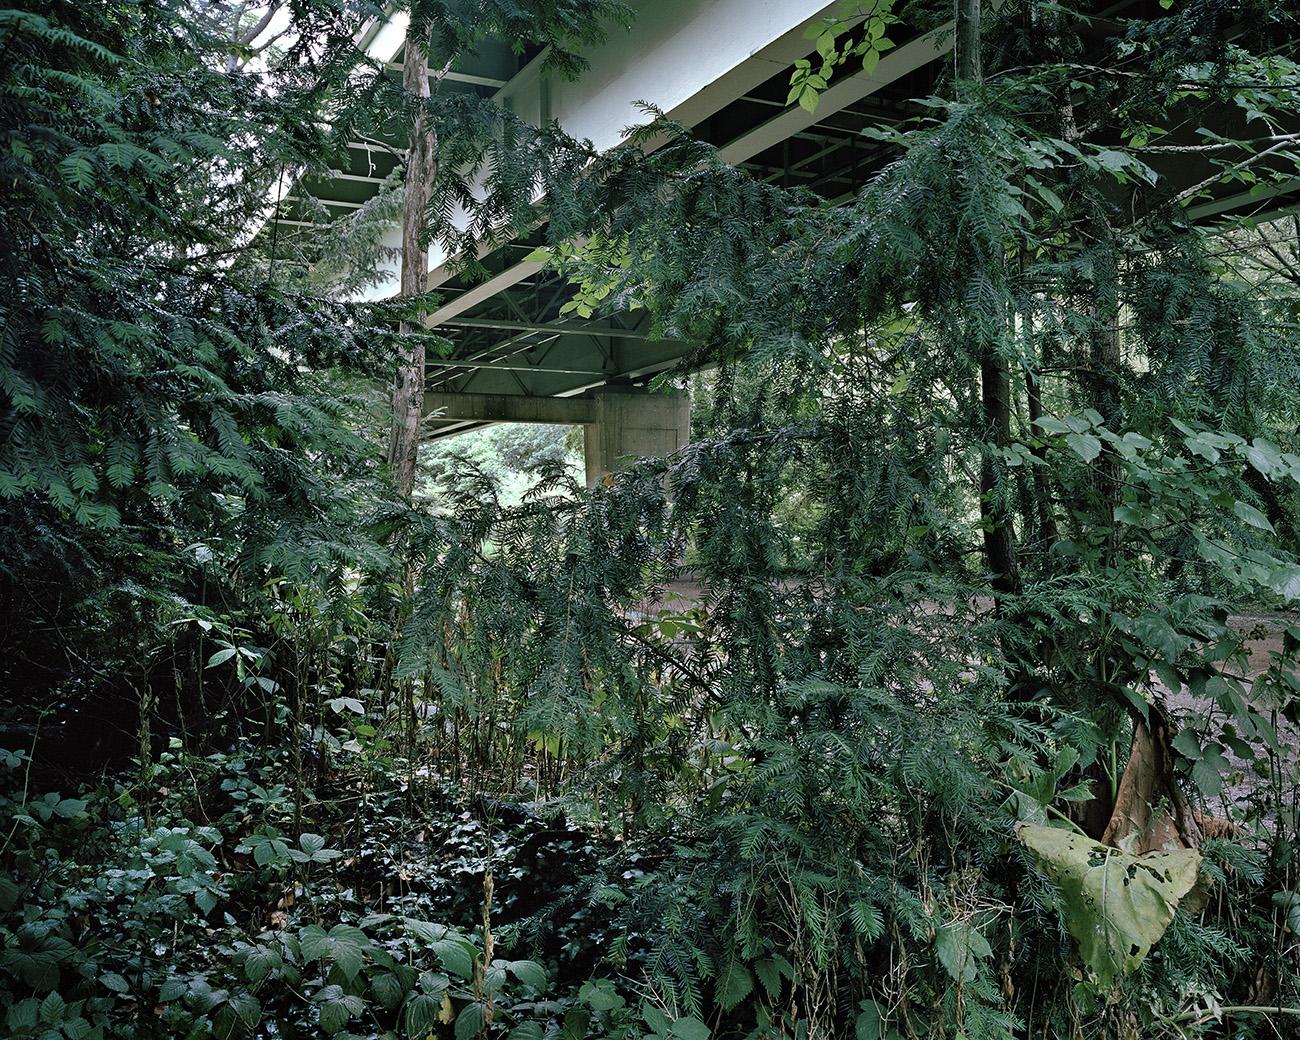 Concrete and wild woodland converge